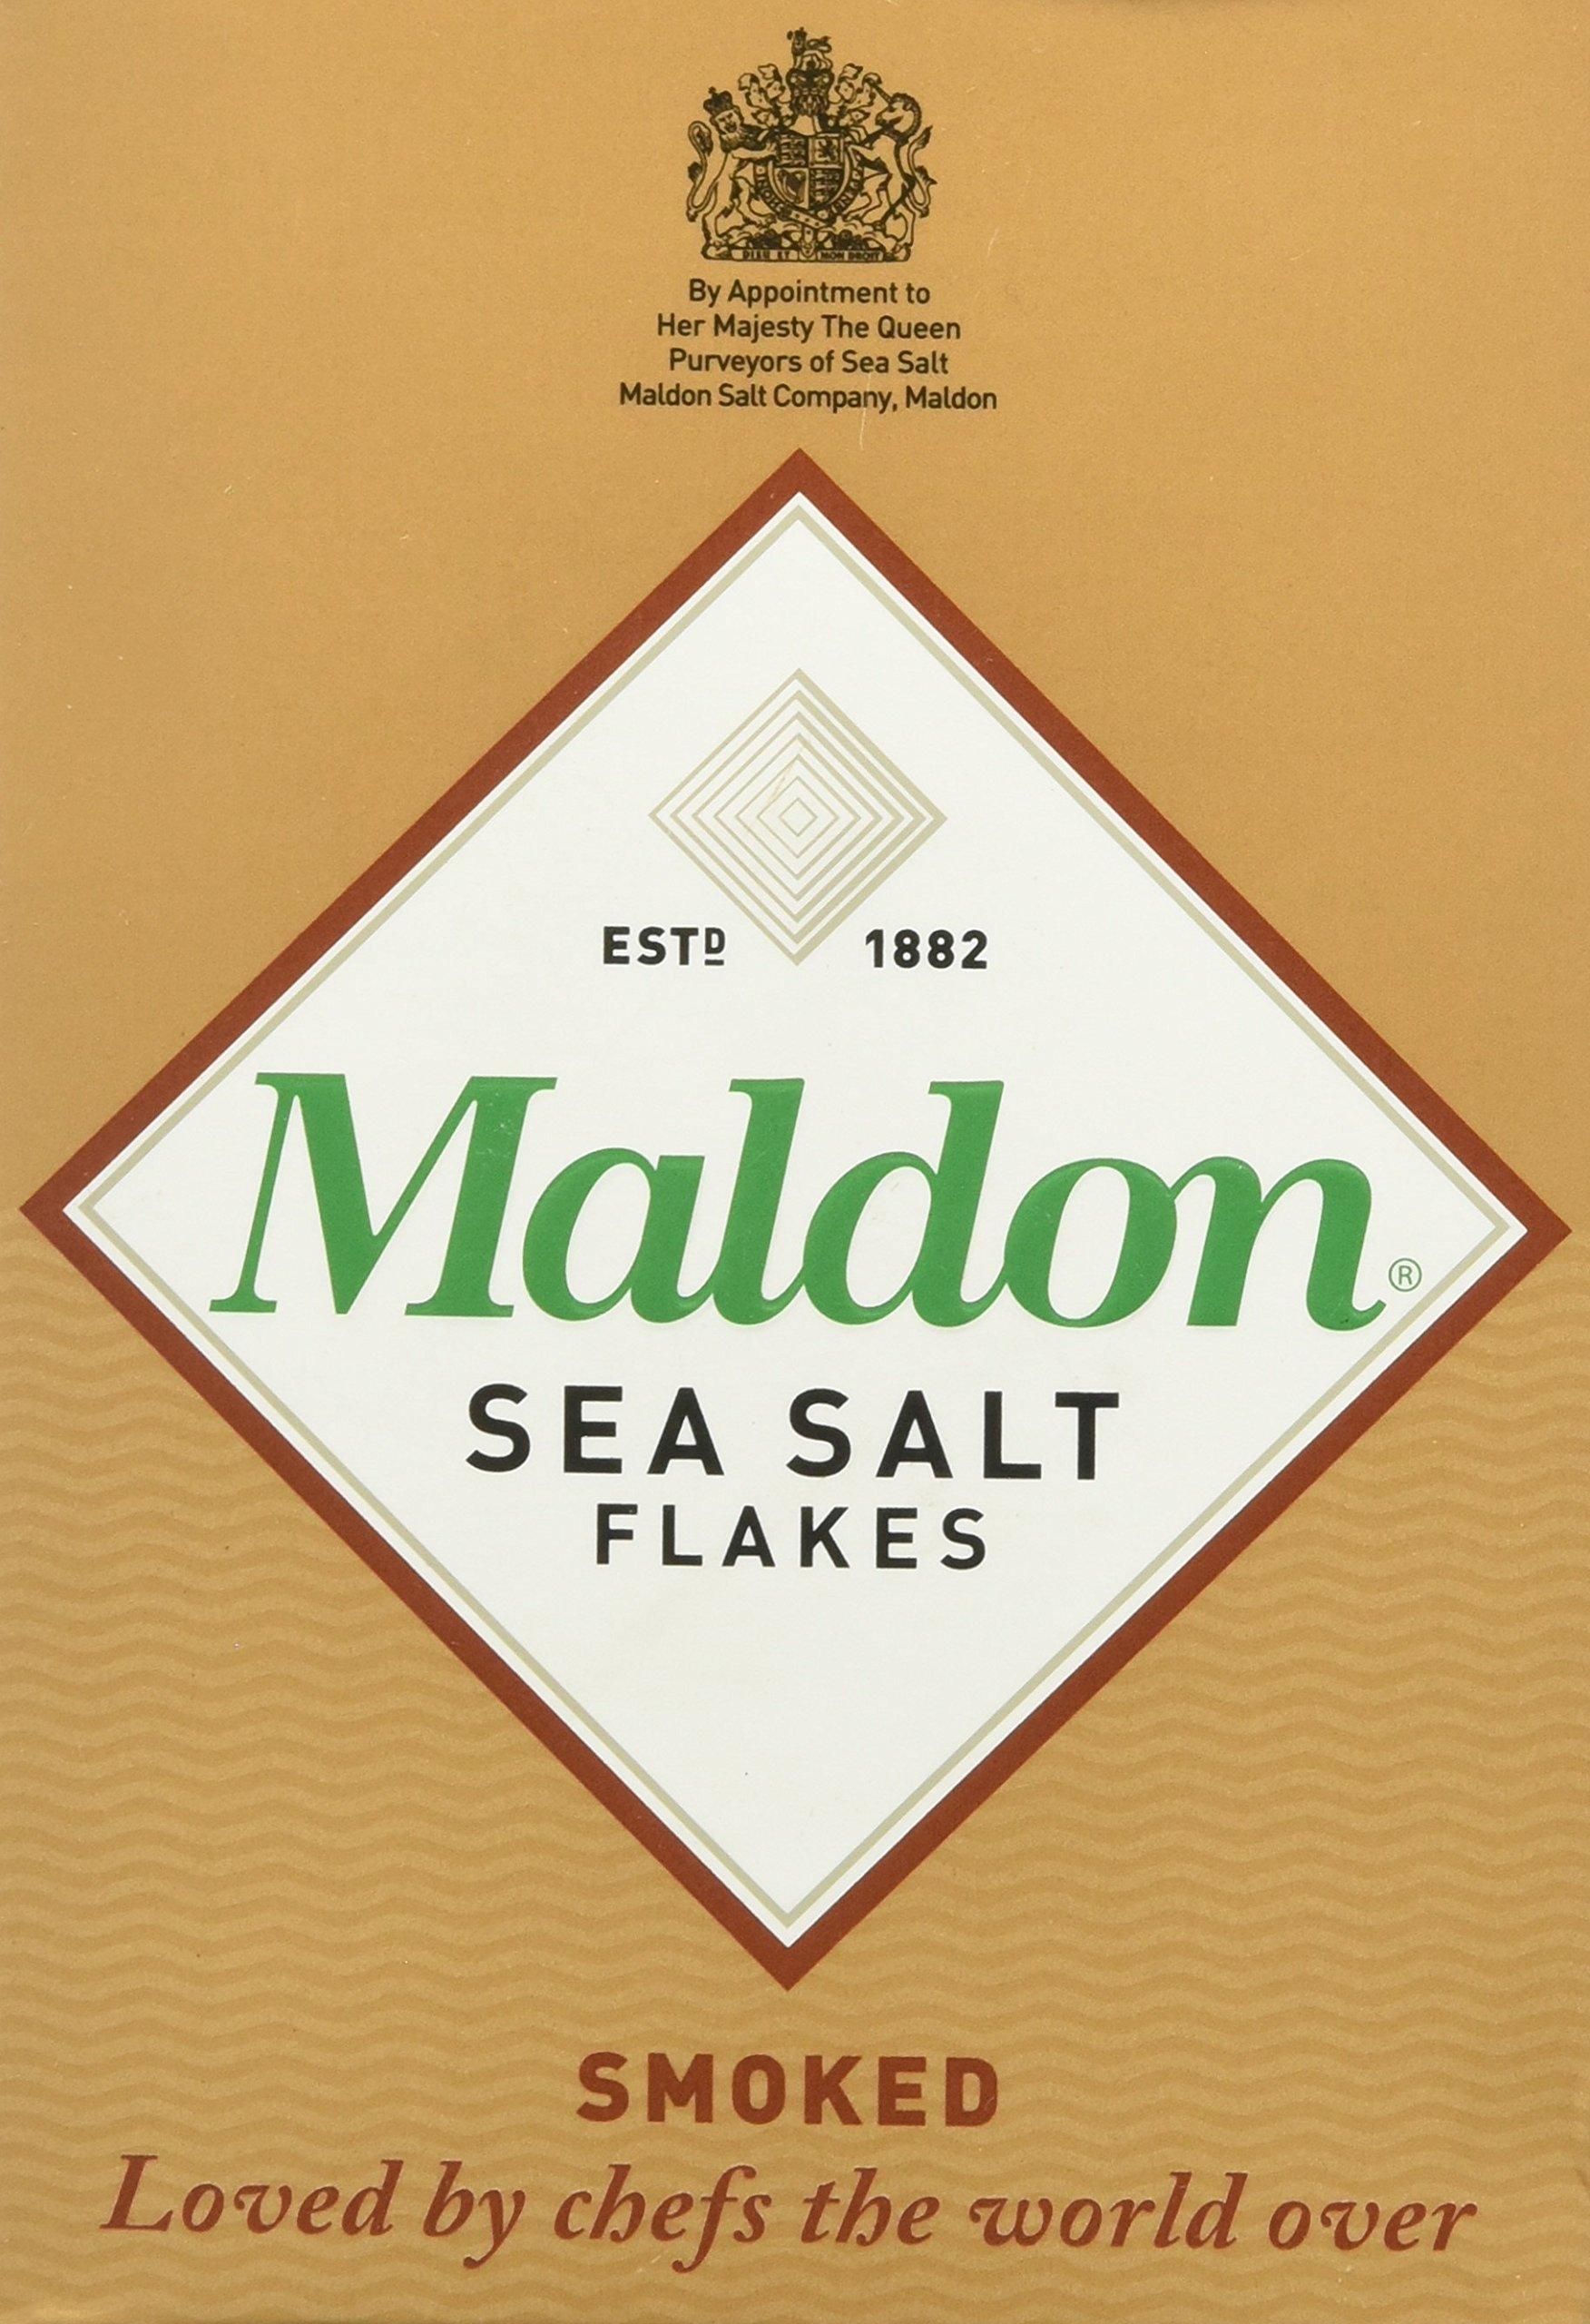 Maldon Smoked Sea Salt Flakes, 4.4 Ounce